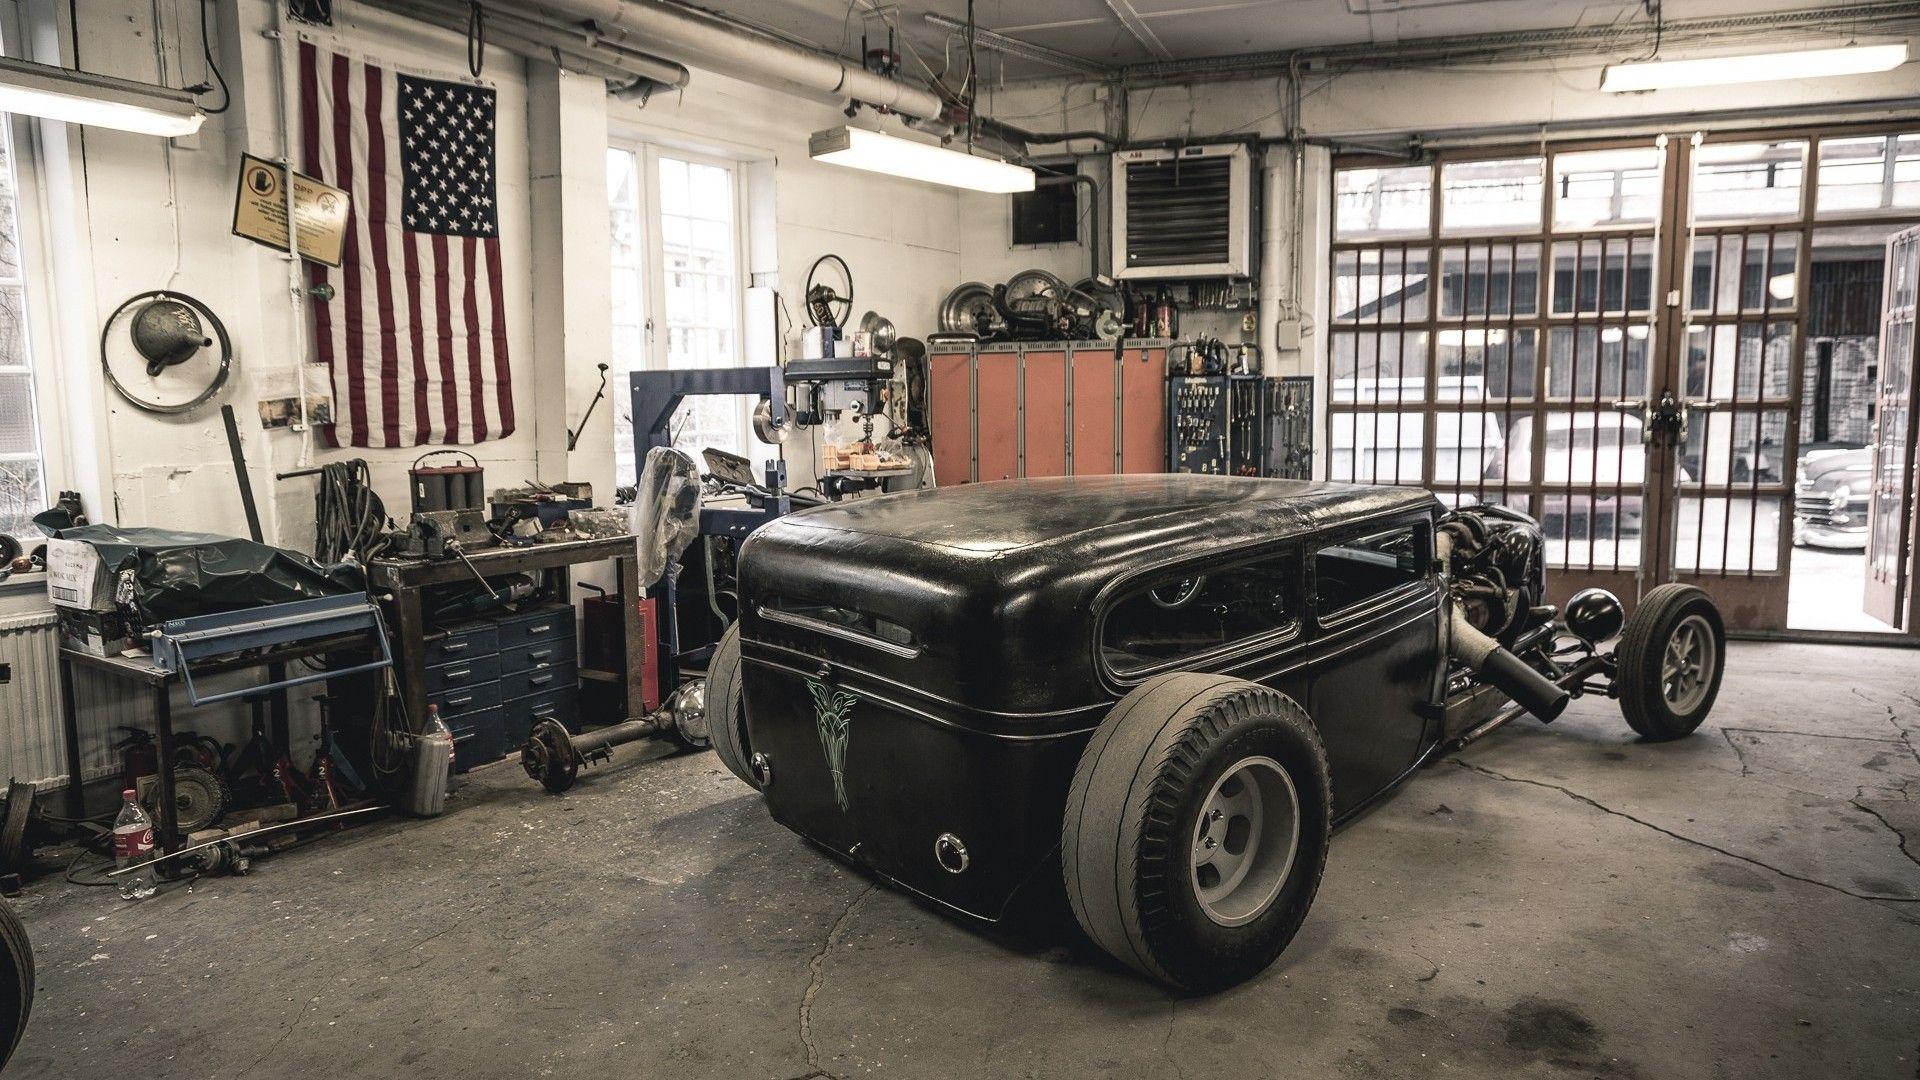 Hot Rod Garage Wallpaper 51937 Rat Rod Hot Rods Cool Garages